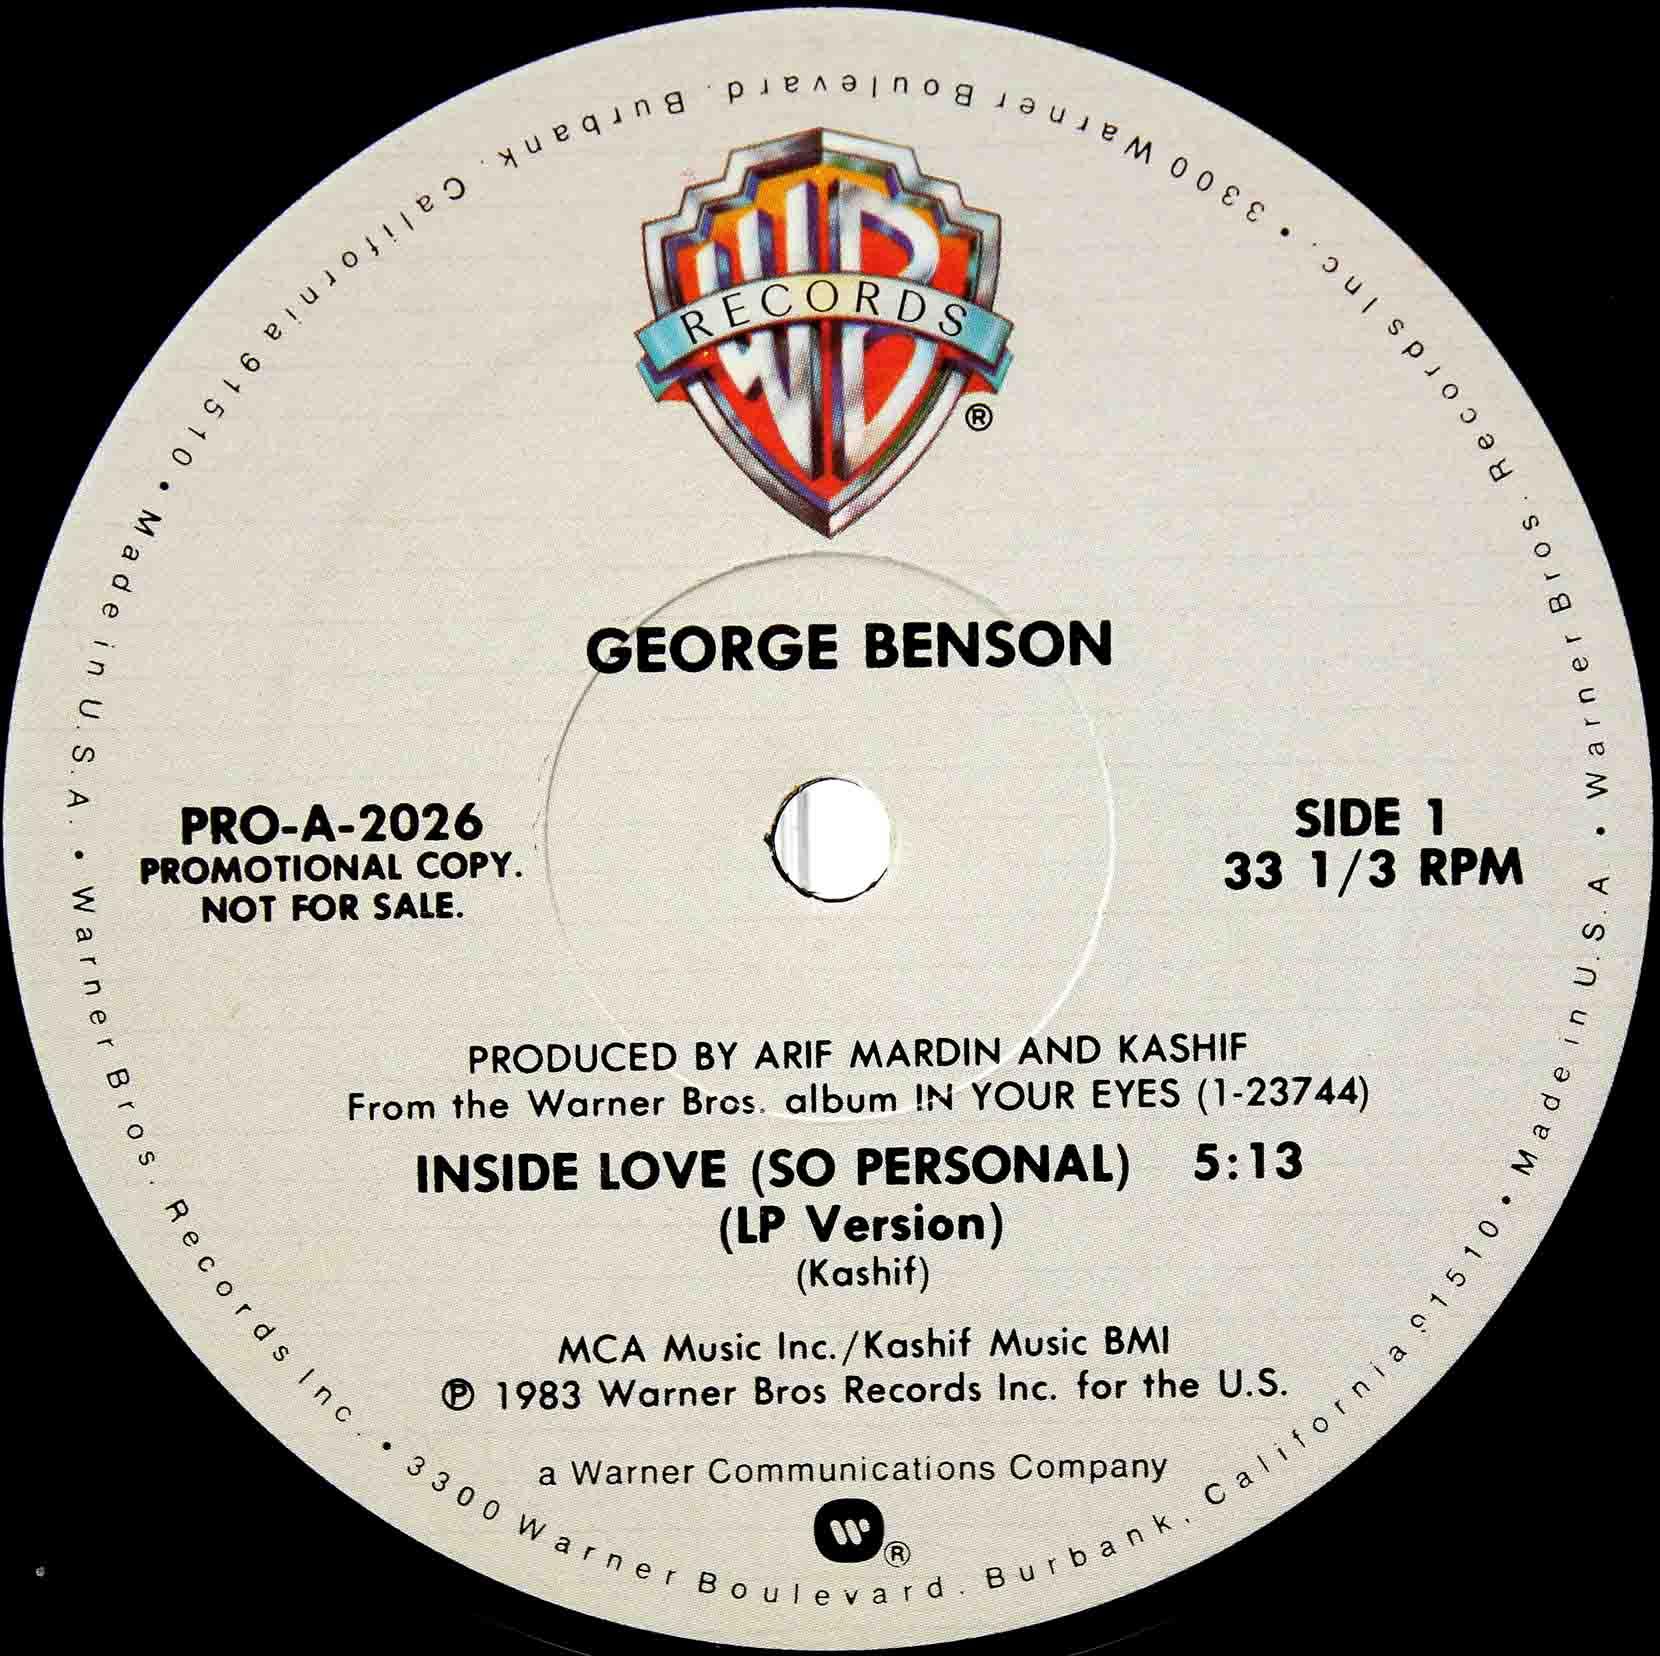 George Benson – Inside Love 02